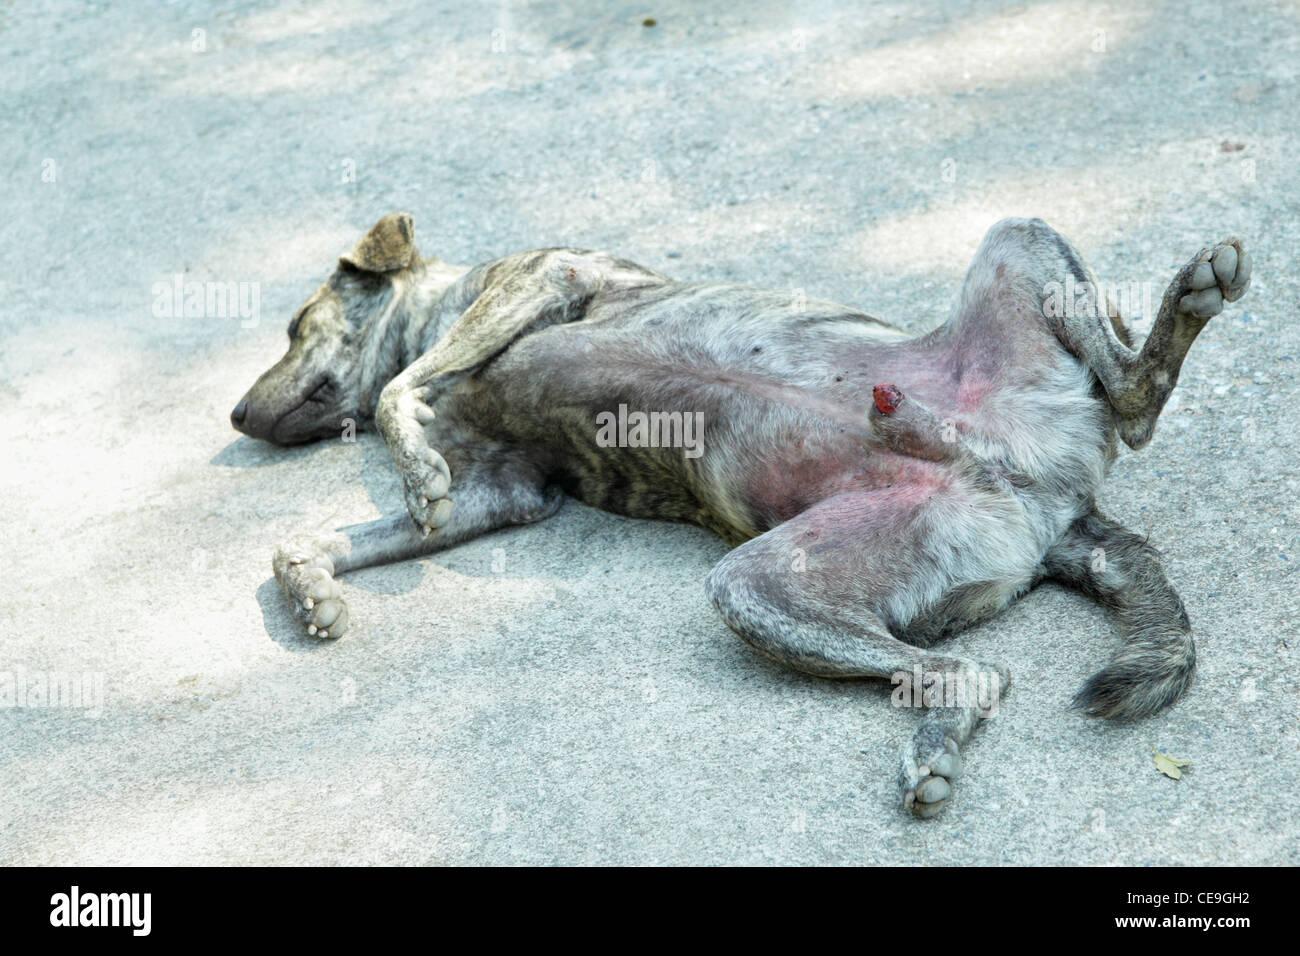 Male dog sleeps cosily on a street - Stock Image